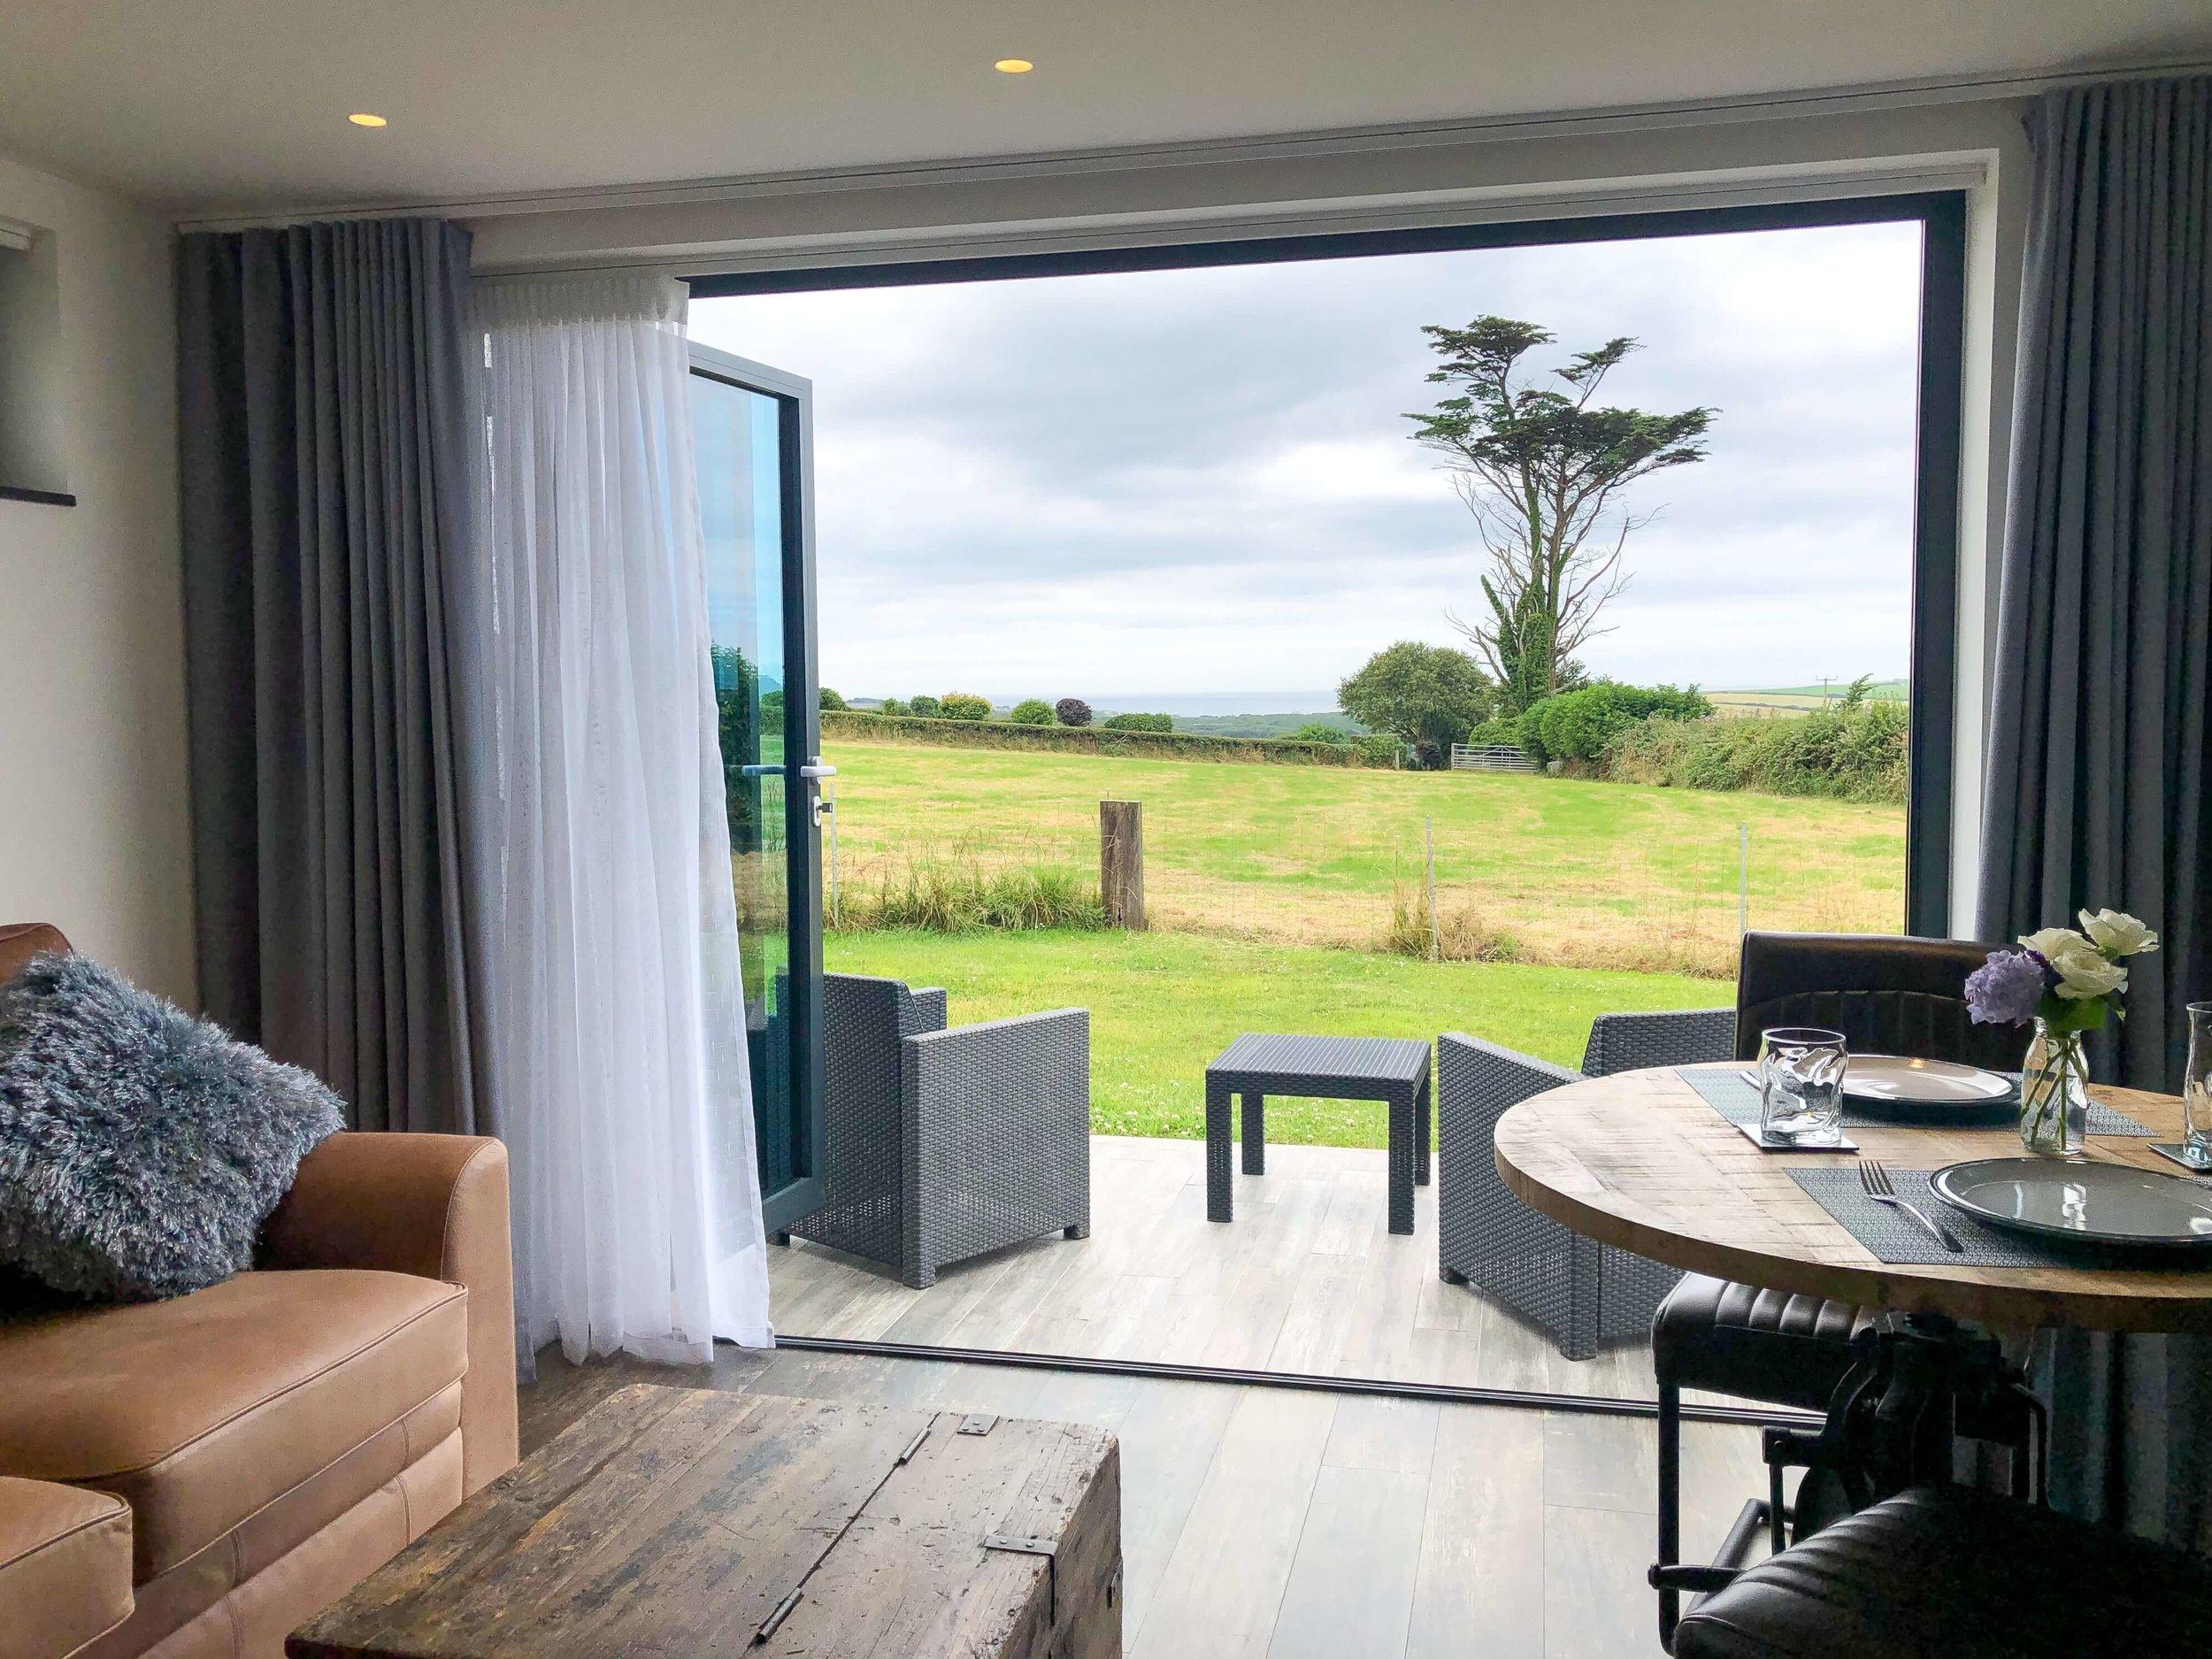 Bi-fold doors with countryside and sea views towards Widemouth Bay, Bude